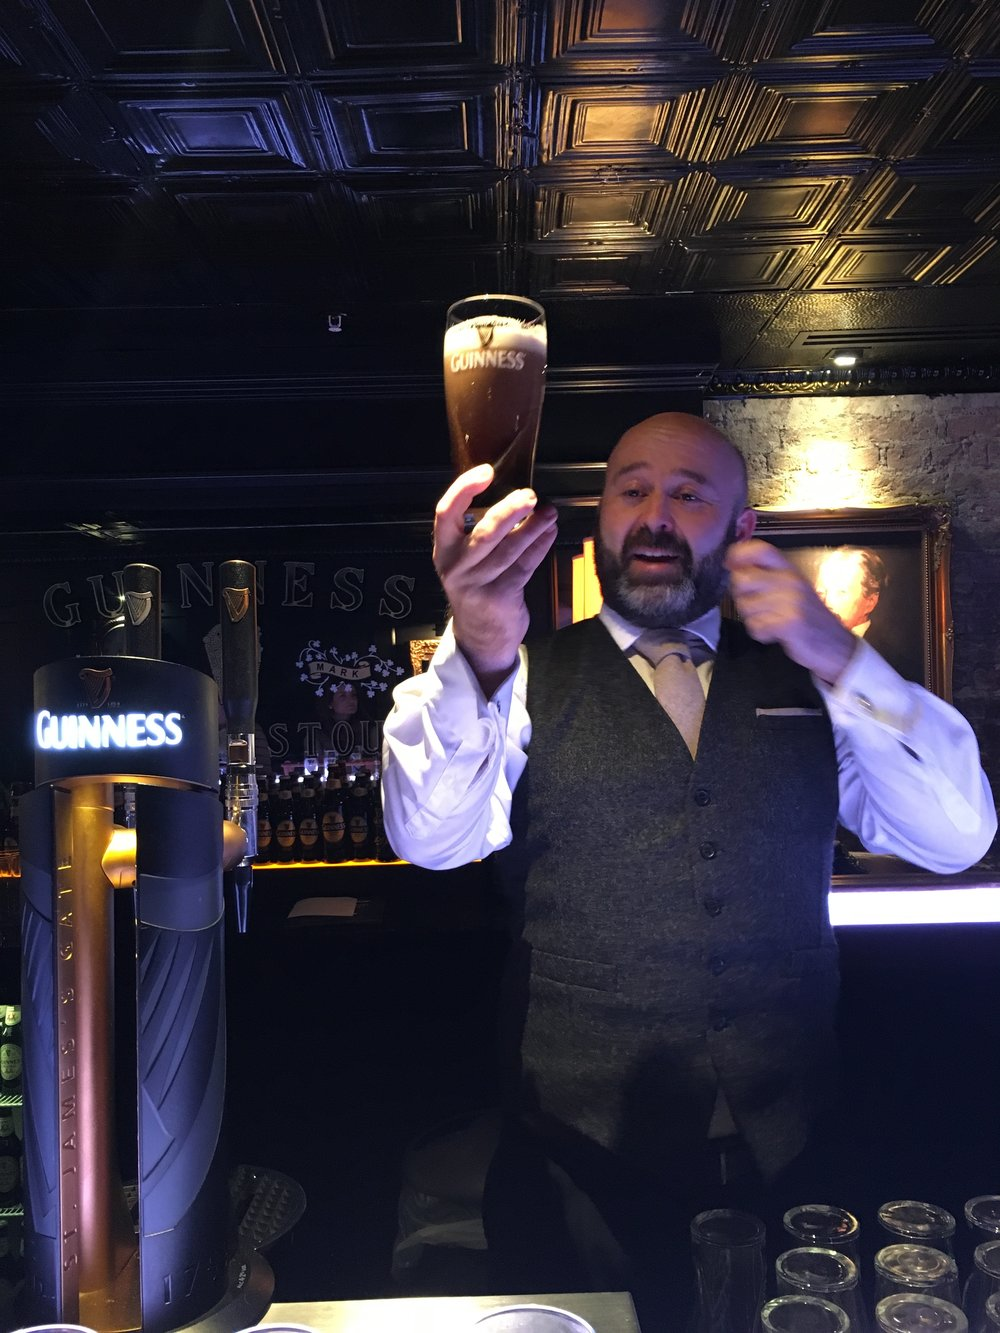 Our bartender, Colm